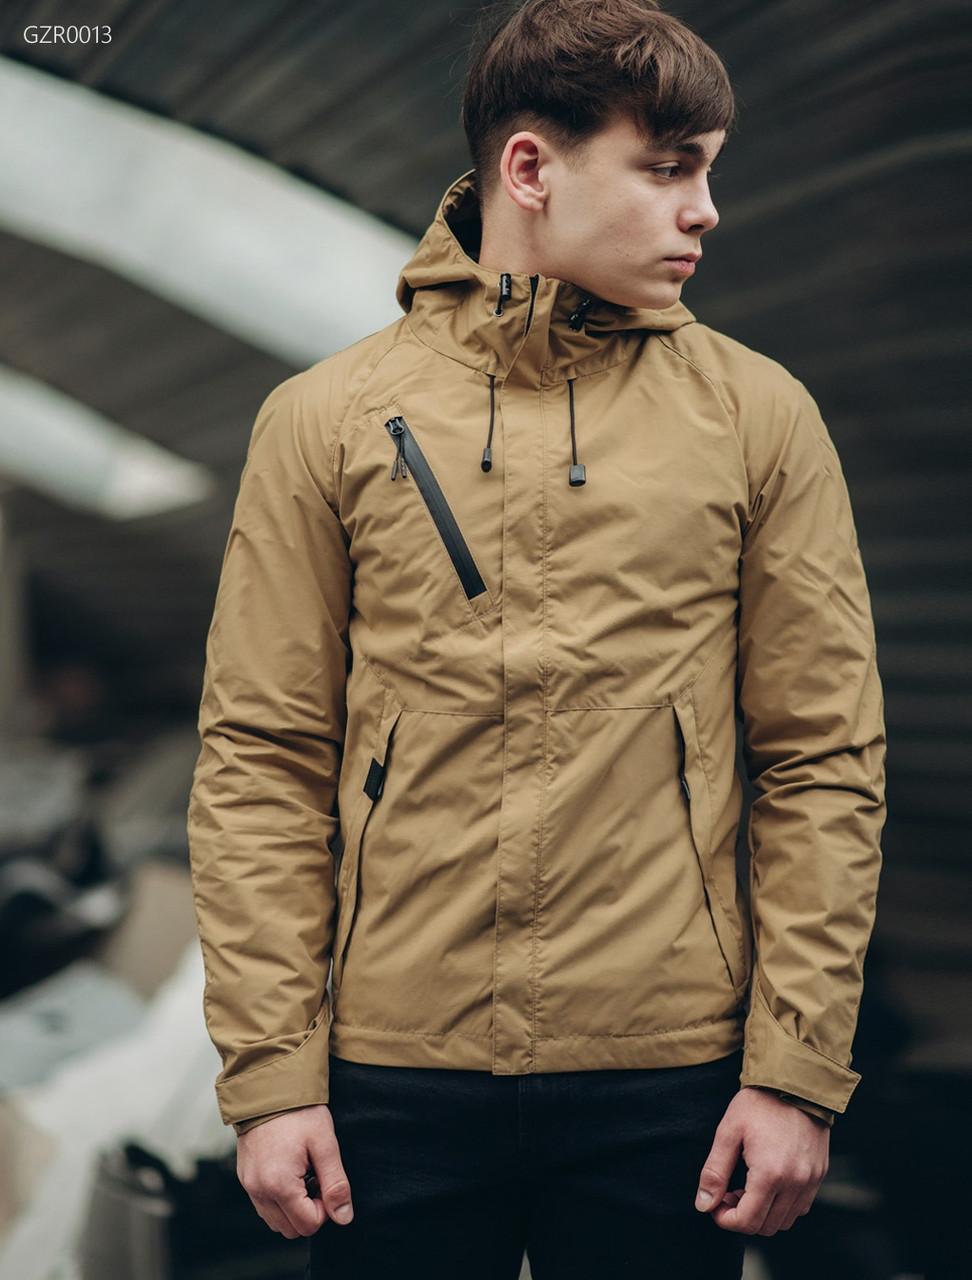 27270d9ee0d Куртка Staff windstorm beige - Интернет магазин Babuza в Черновцах